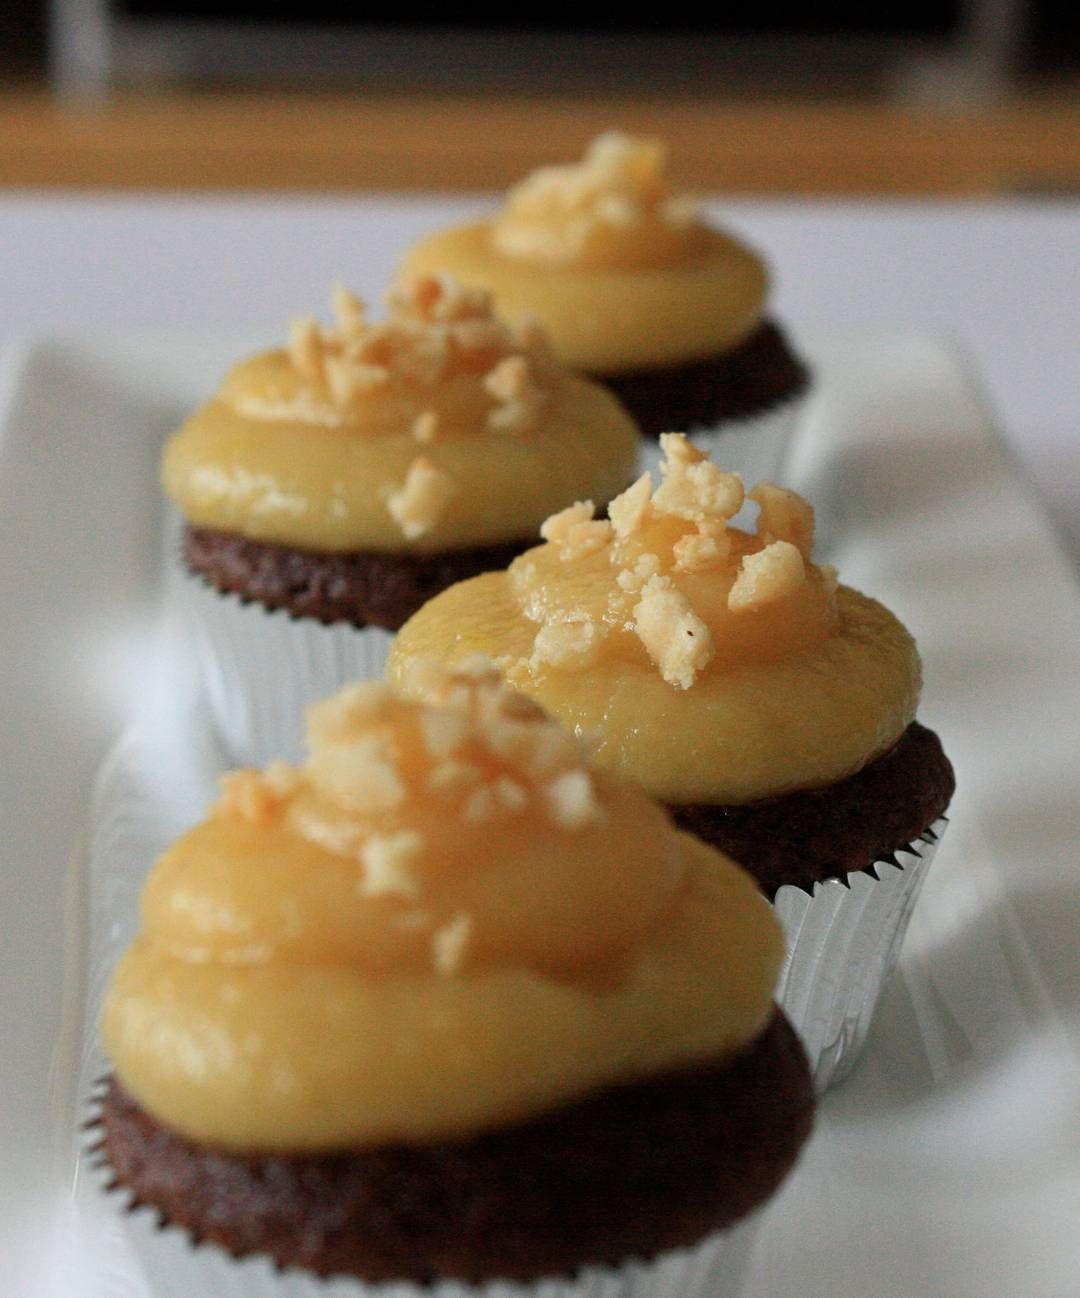 Happy nationalchocolatecupcakeday celebrate by making